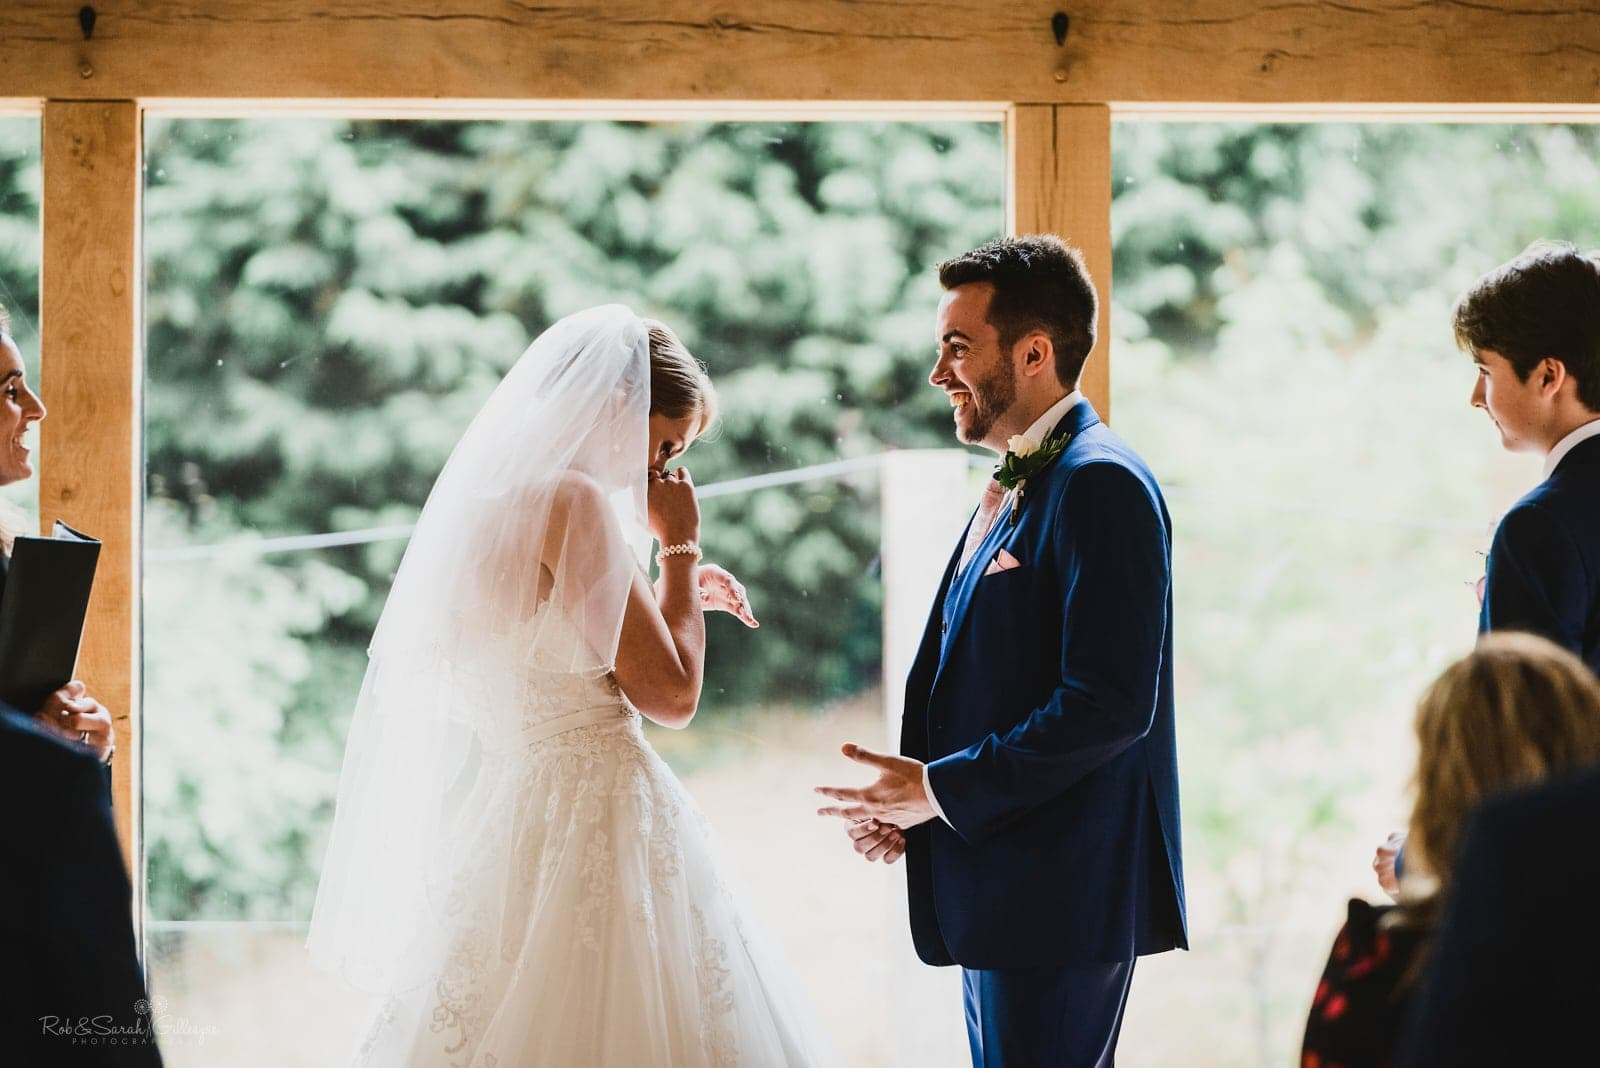 Bride gets emotional during wedding vows